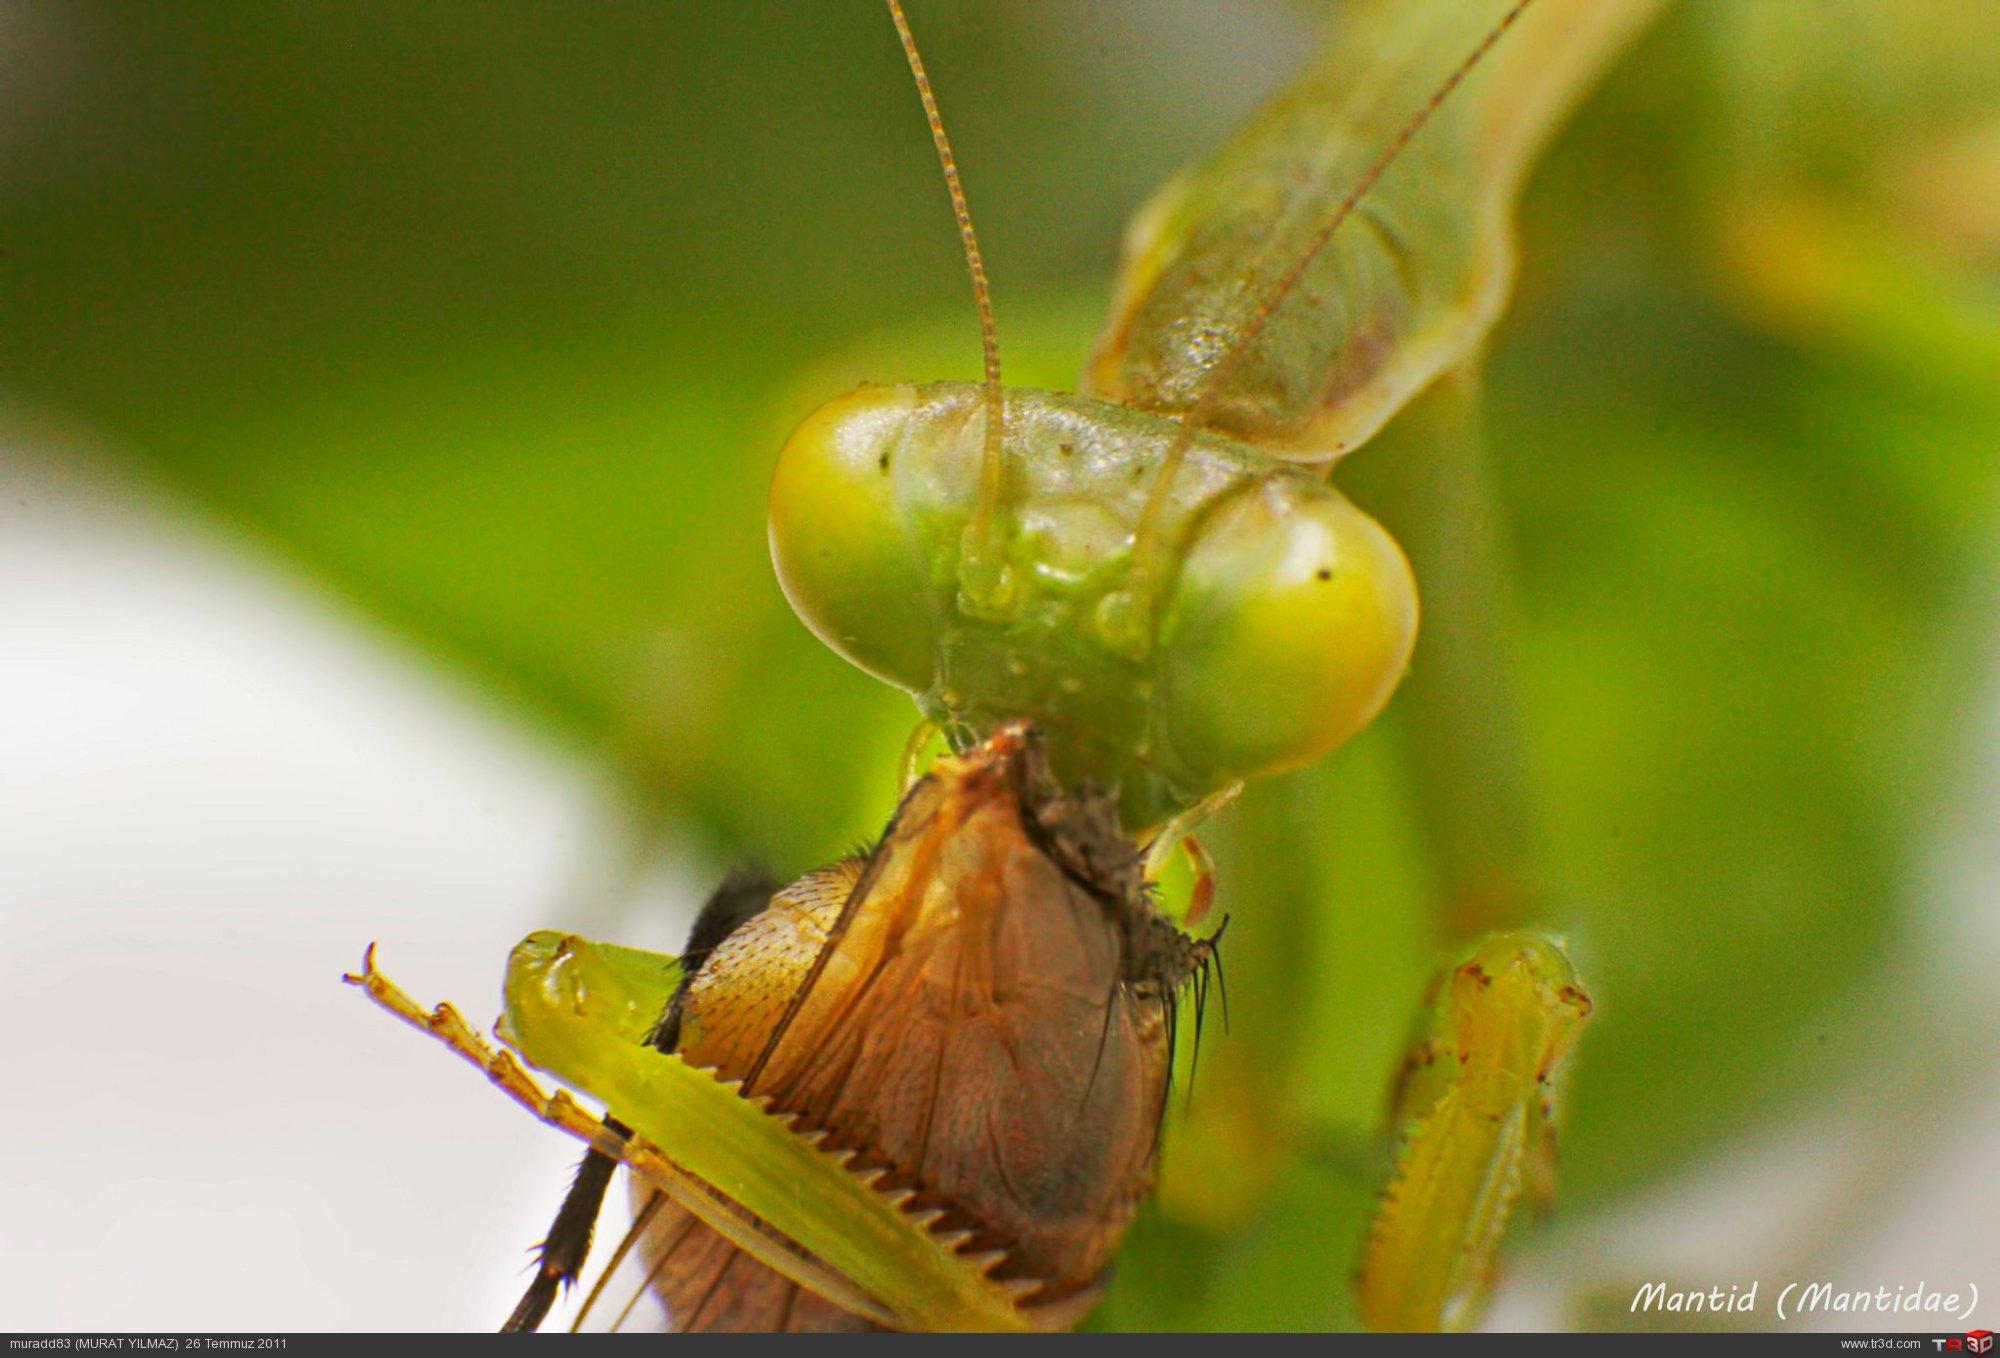 Mantid (Mantidae)-1 2